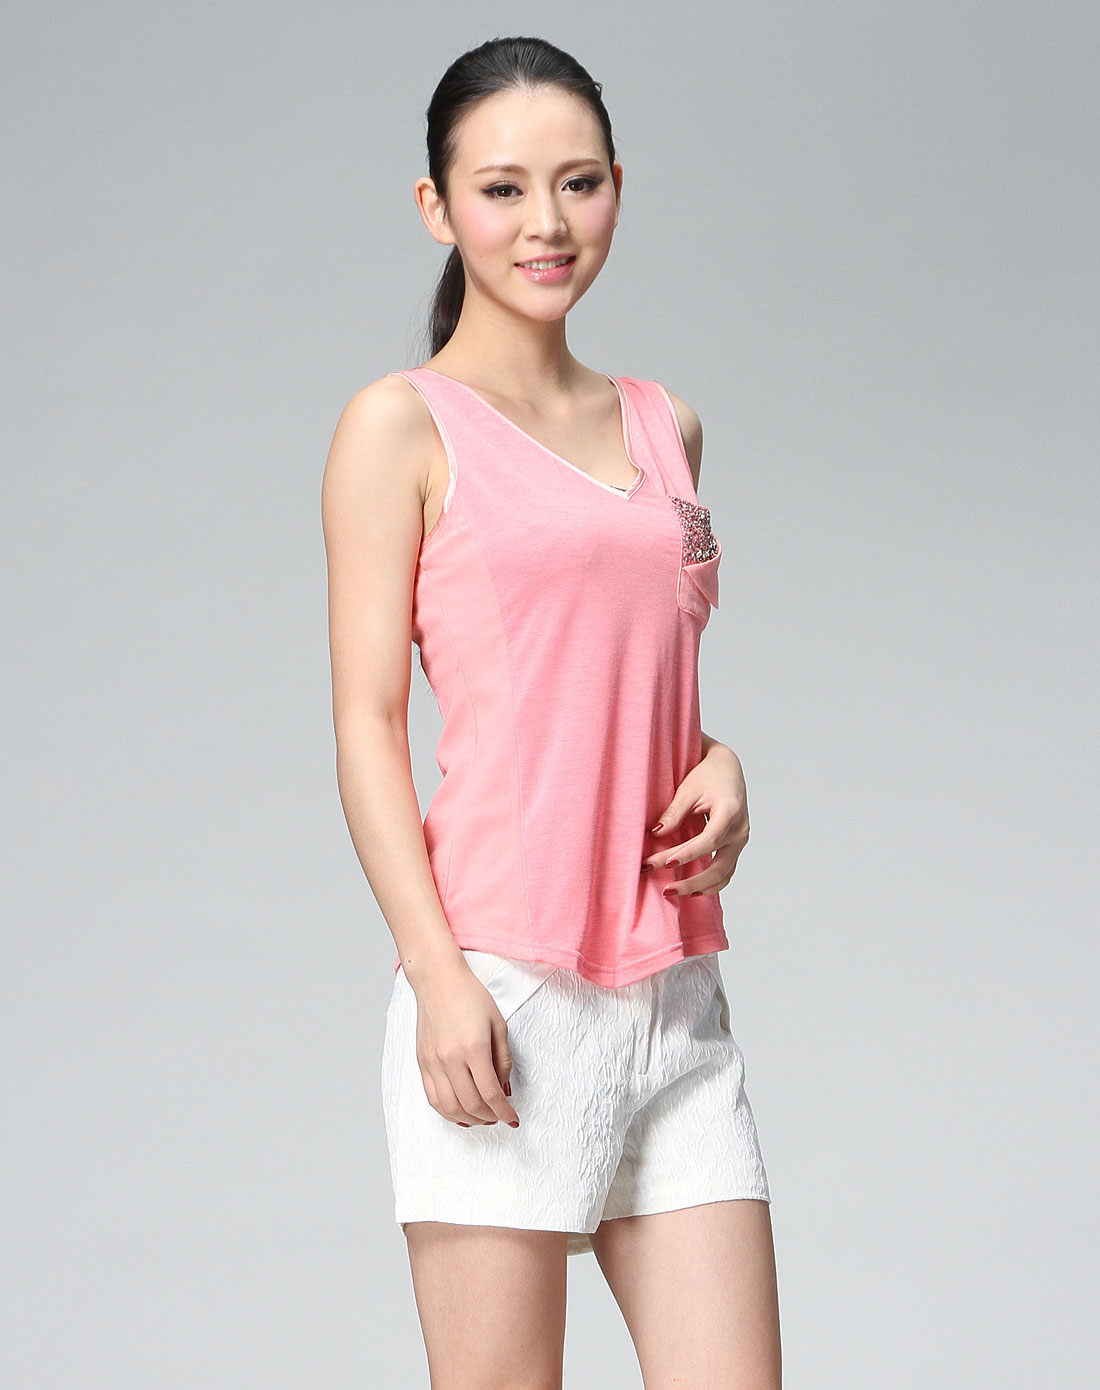 shine粉红色拼接时尚针织背心sfg2bx261r02